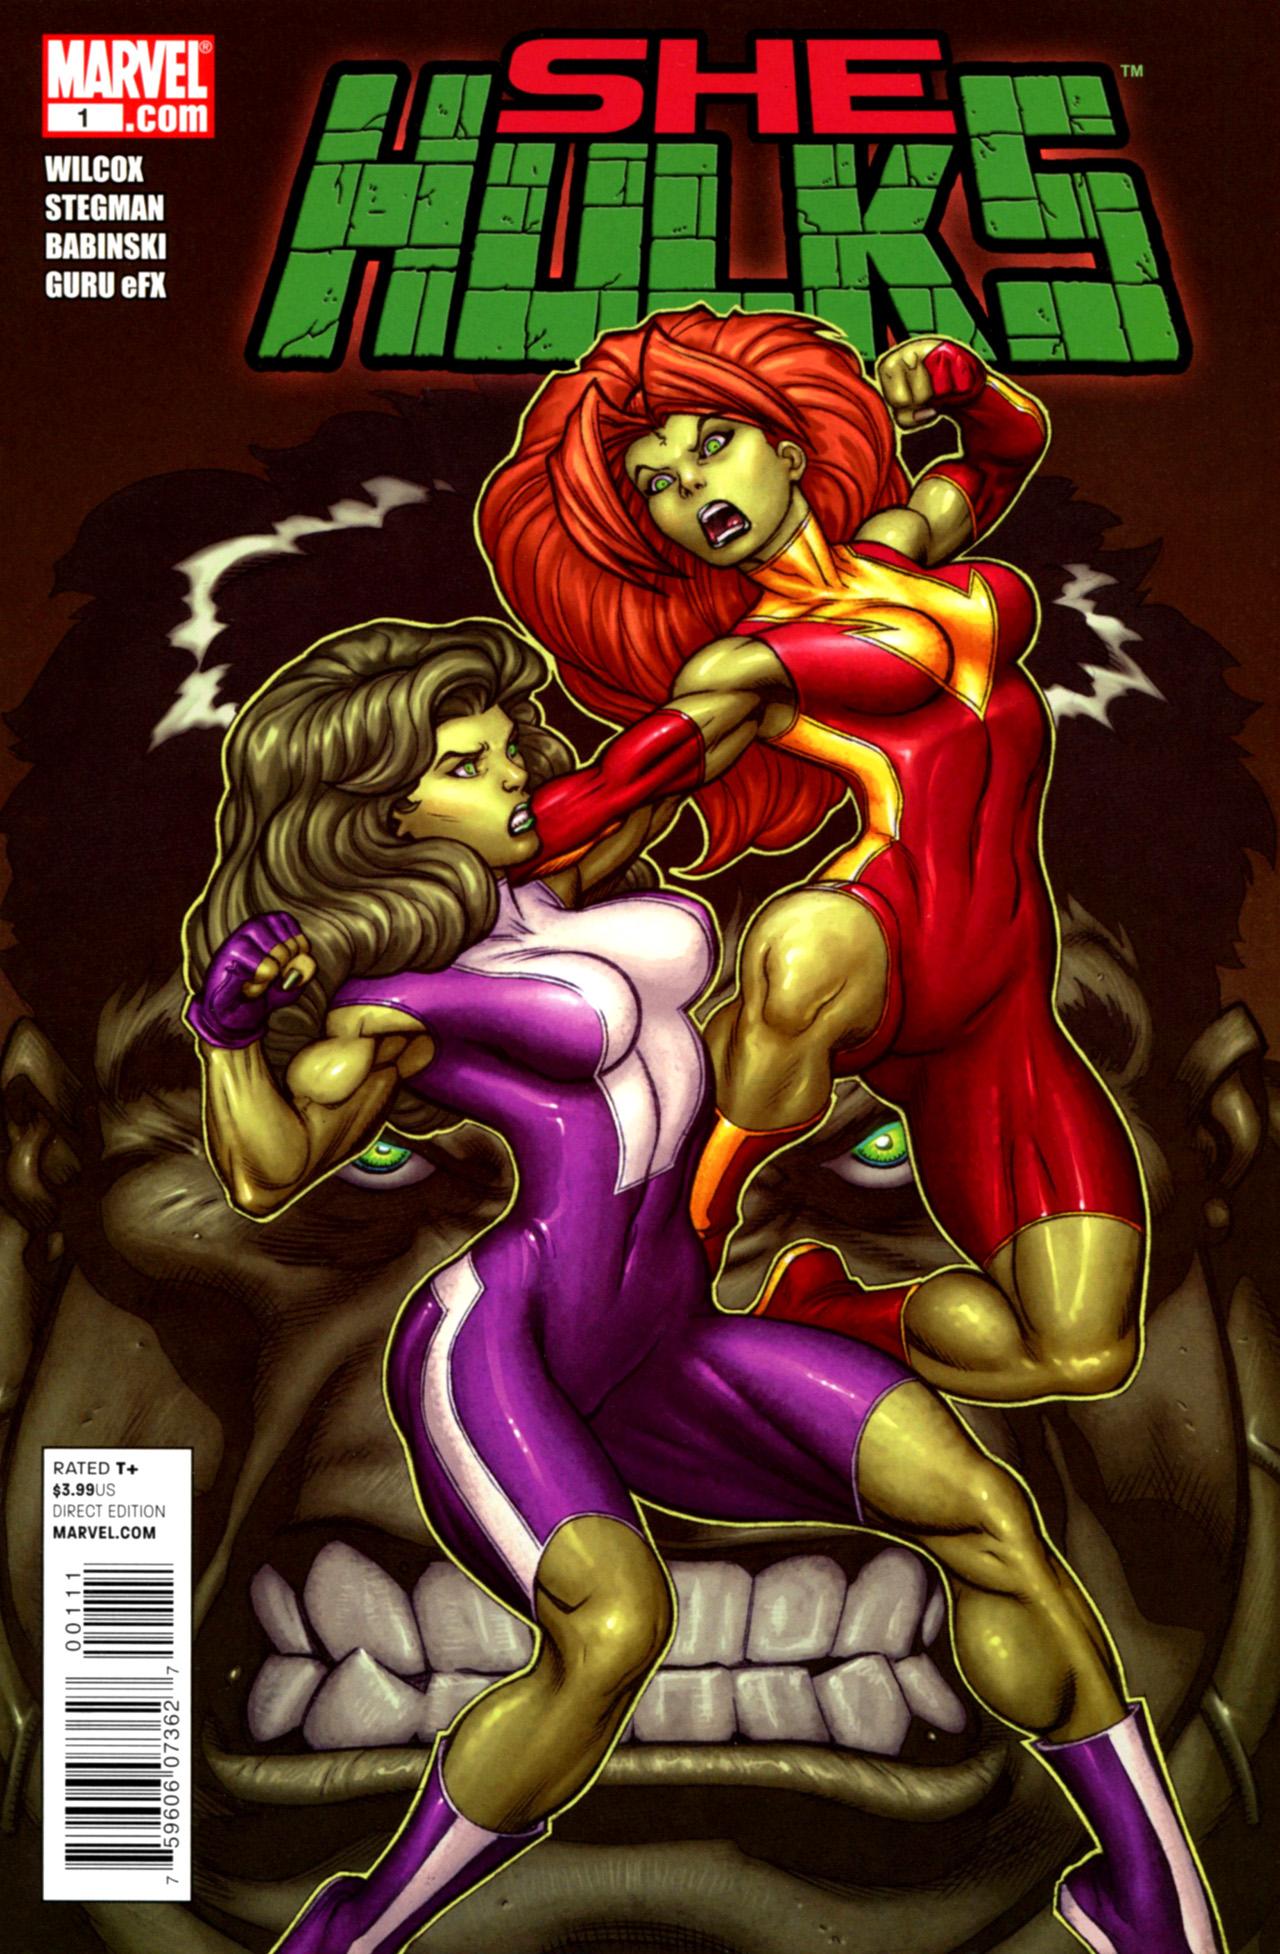 Read online She-Hulks comic -  Issue #1 - 1